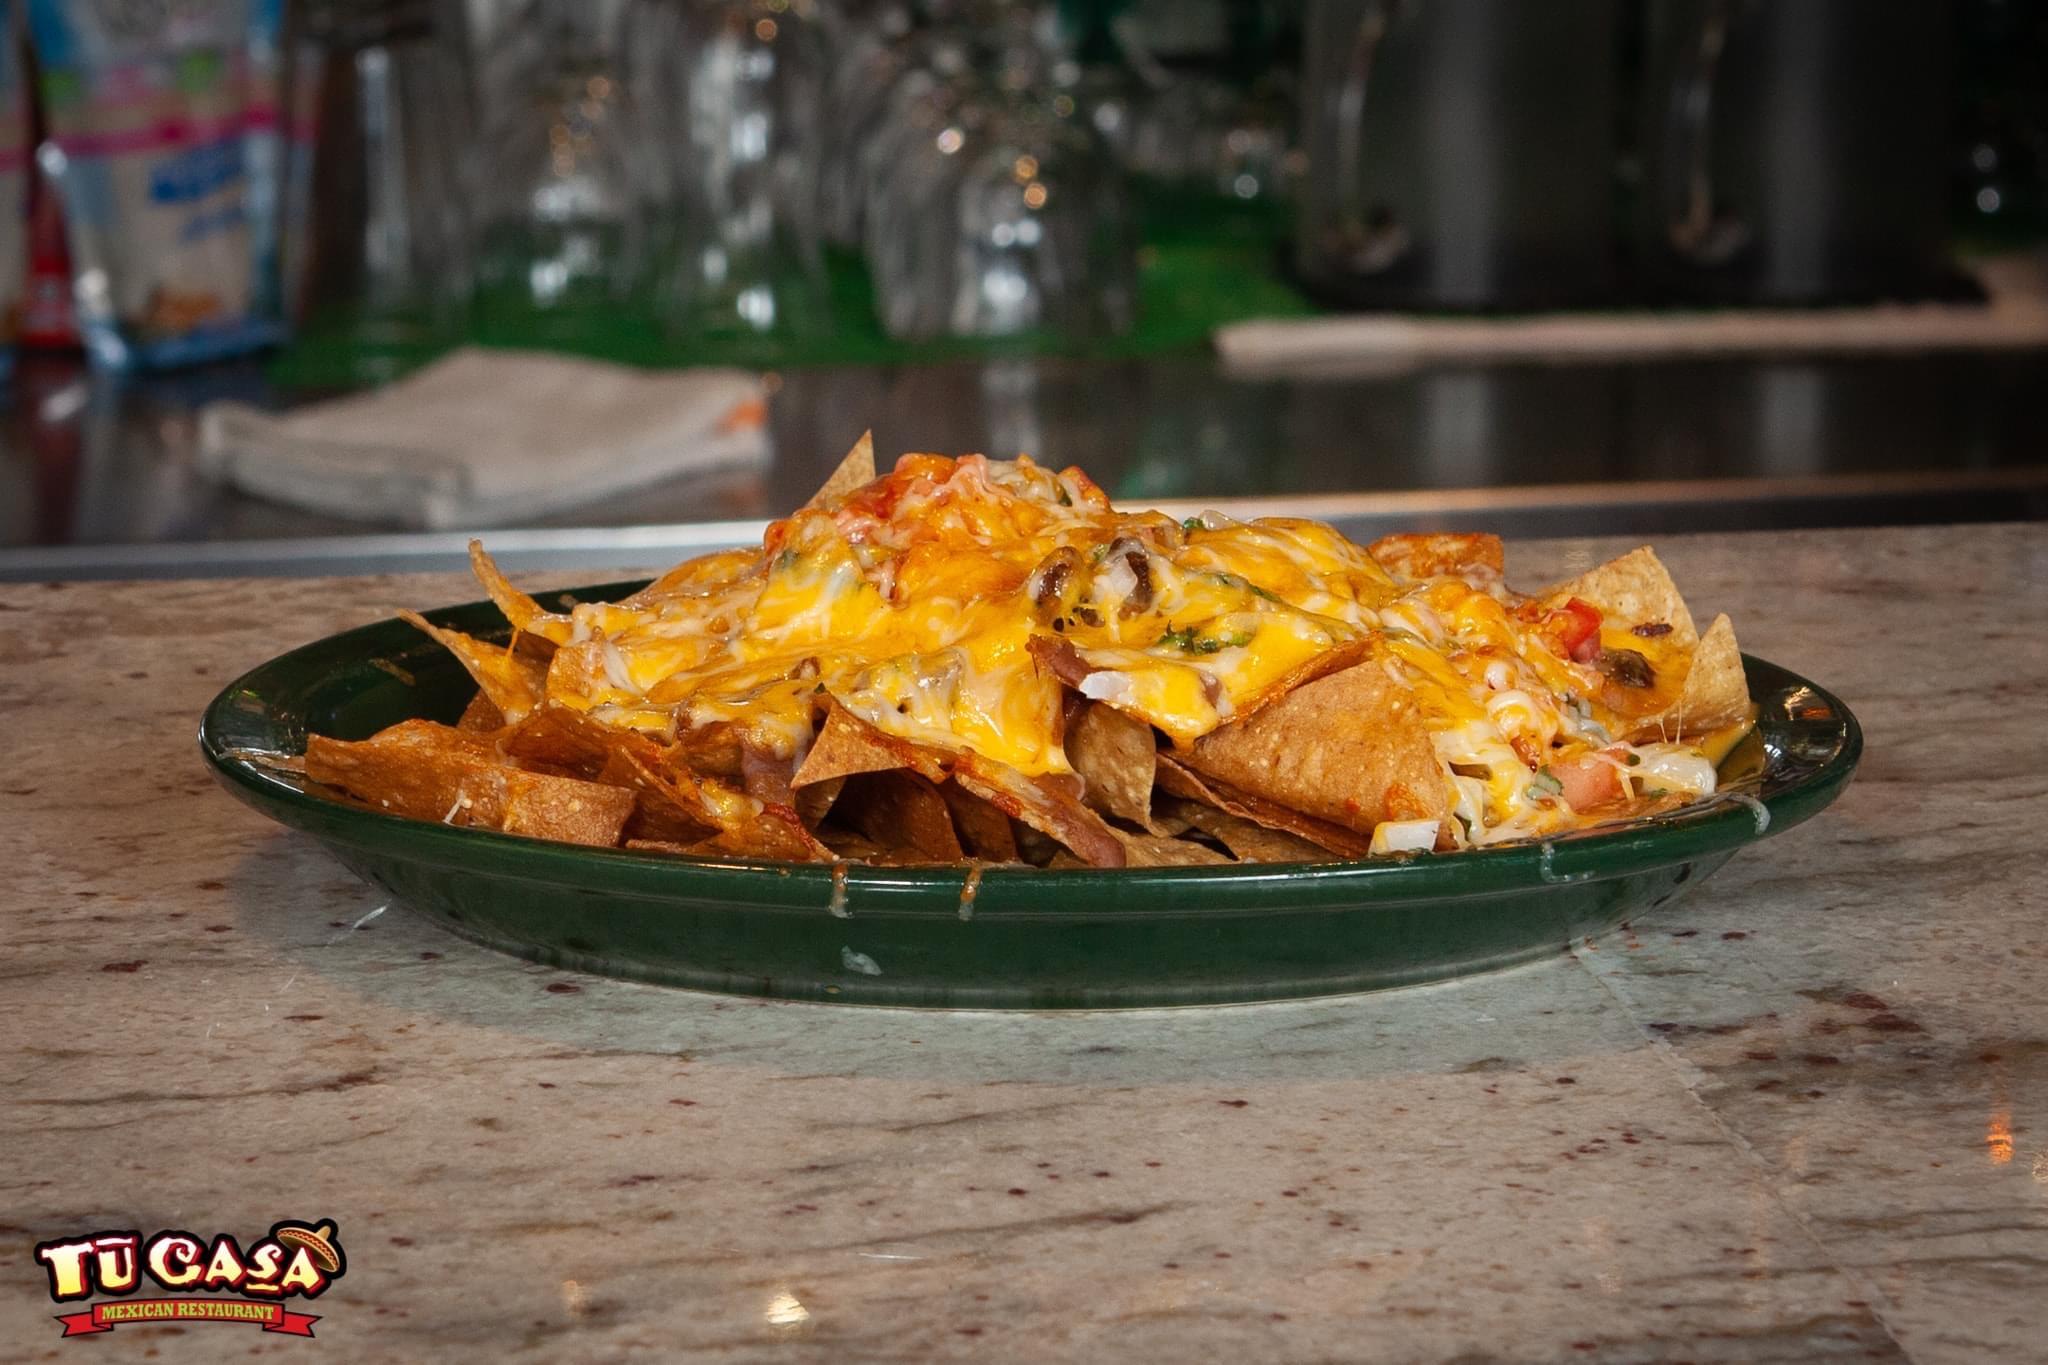 Tu Casa Mexican Restaurant Nacho Specials